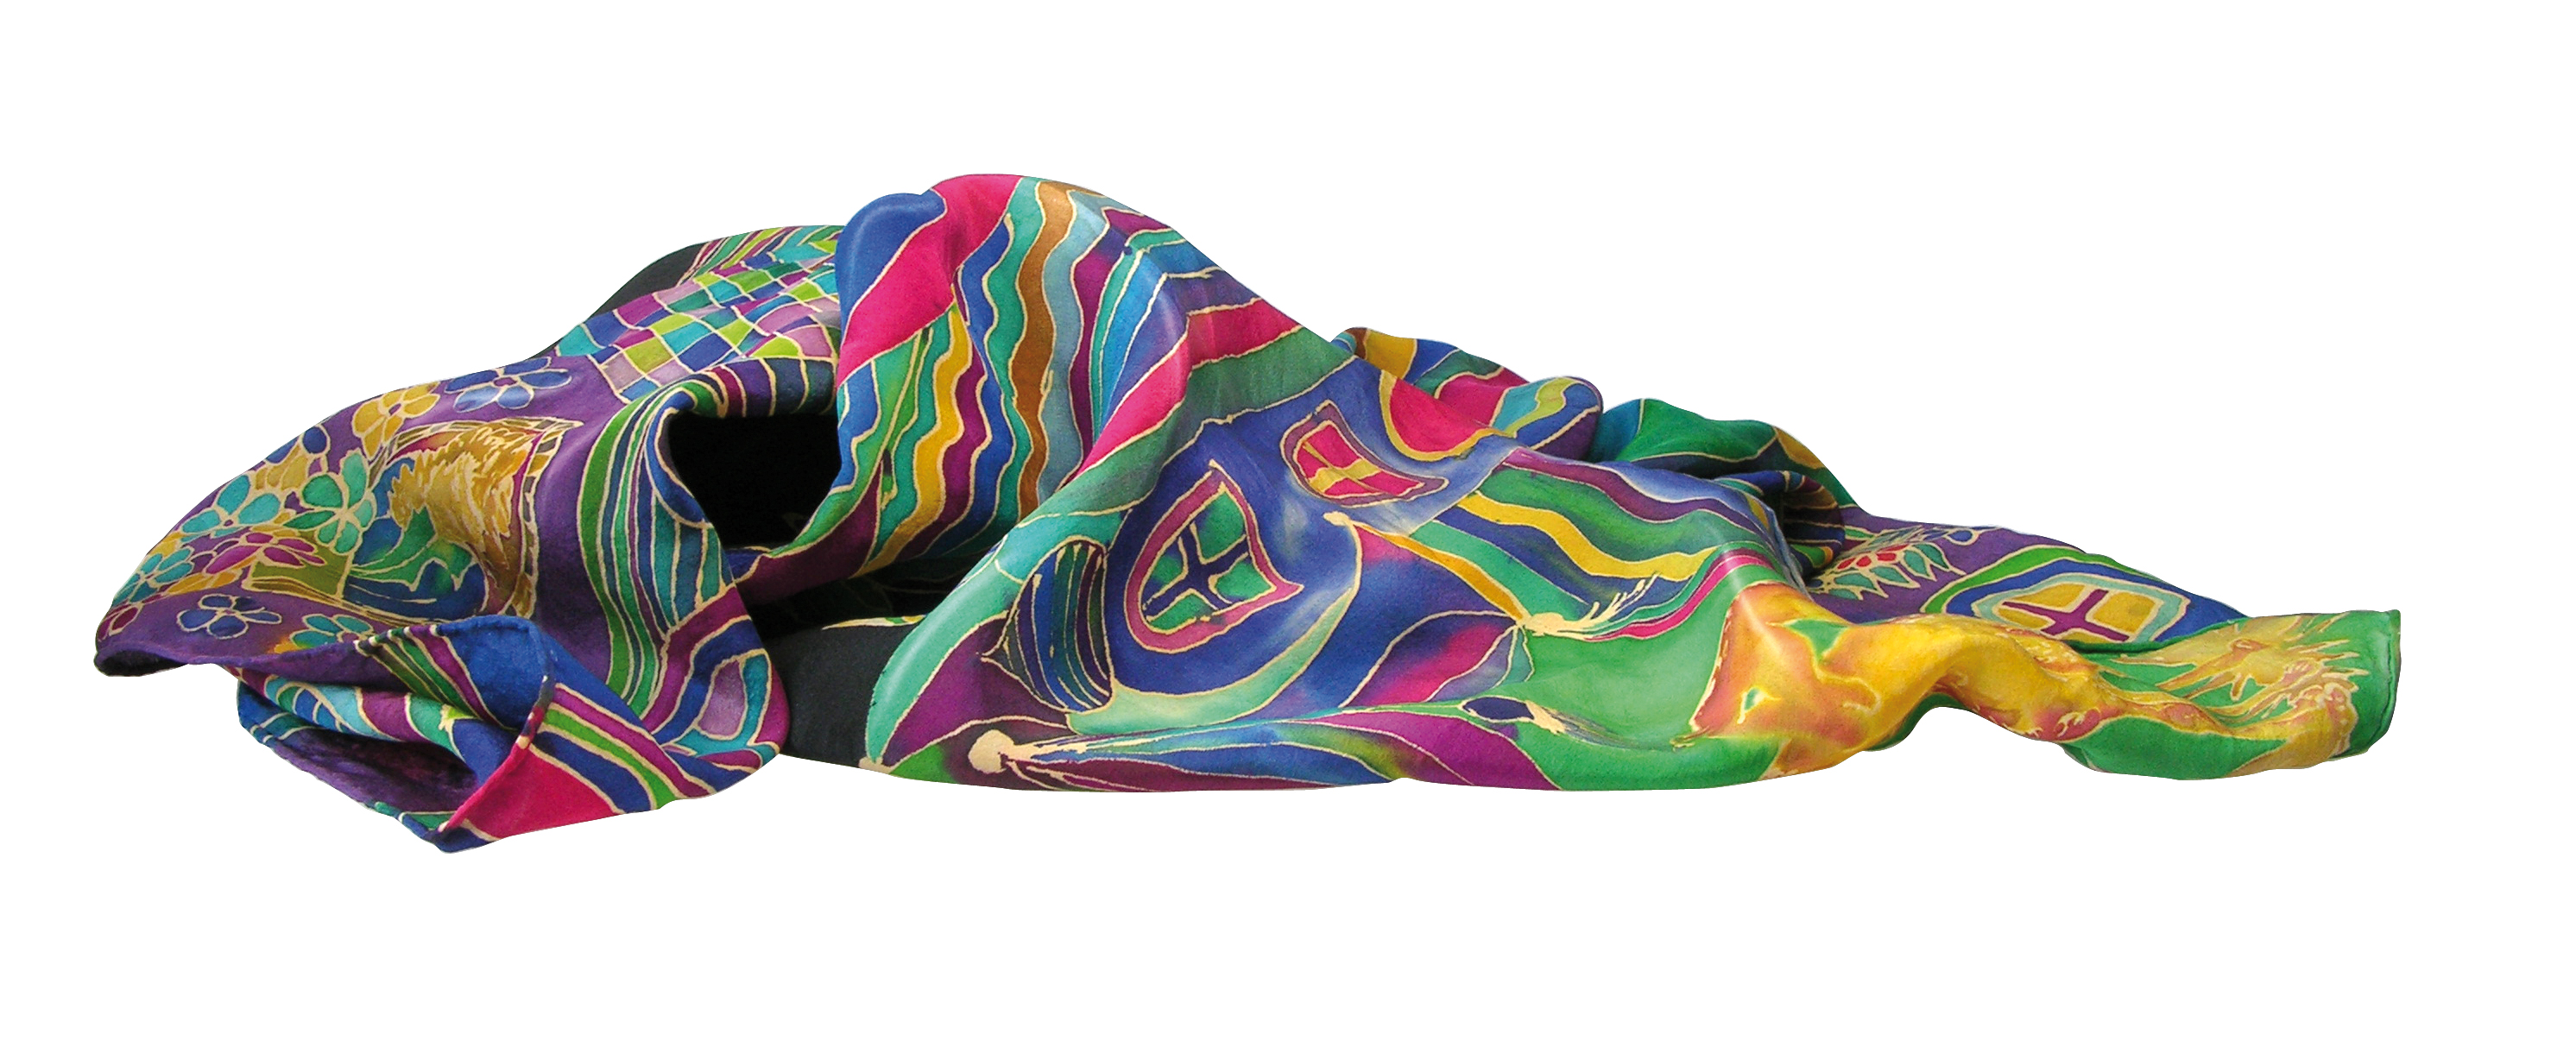 Seiden Art - Bügelfixierbare Seidenmalfarben